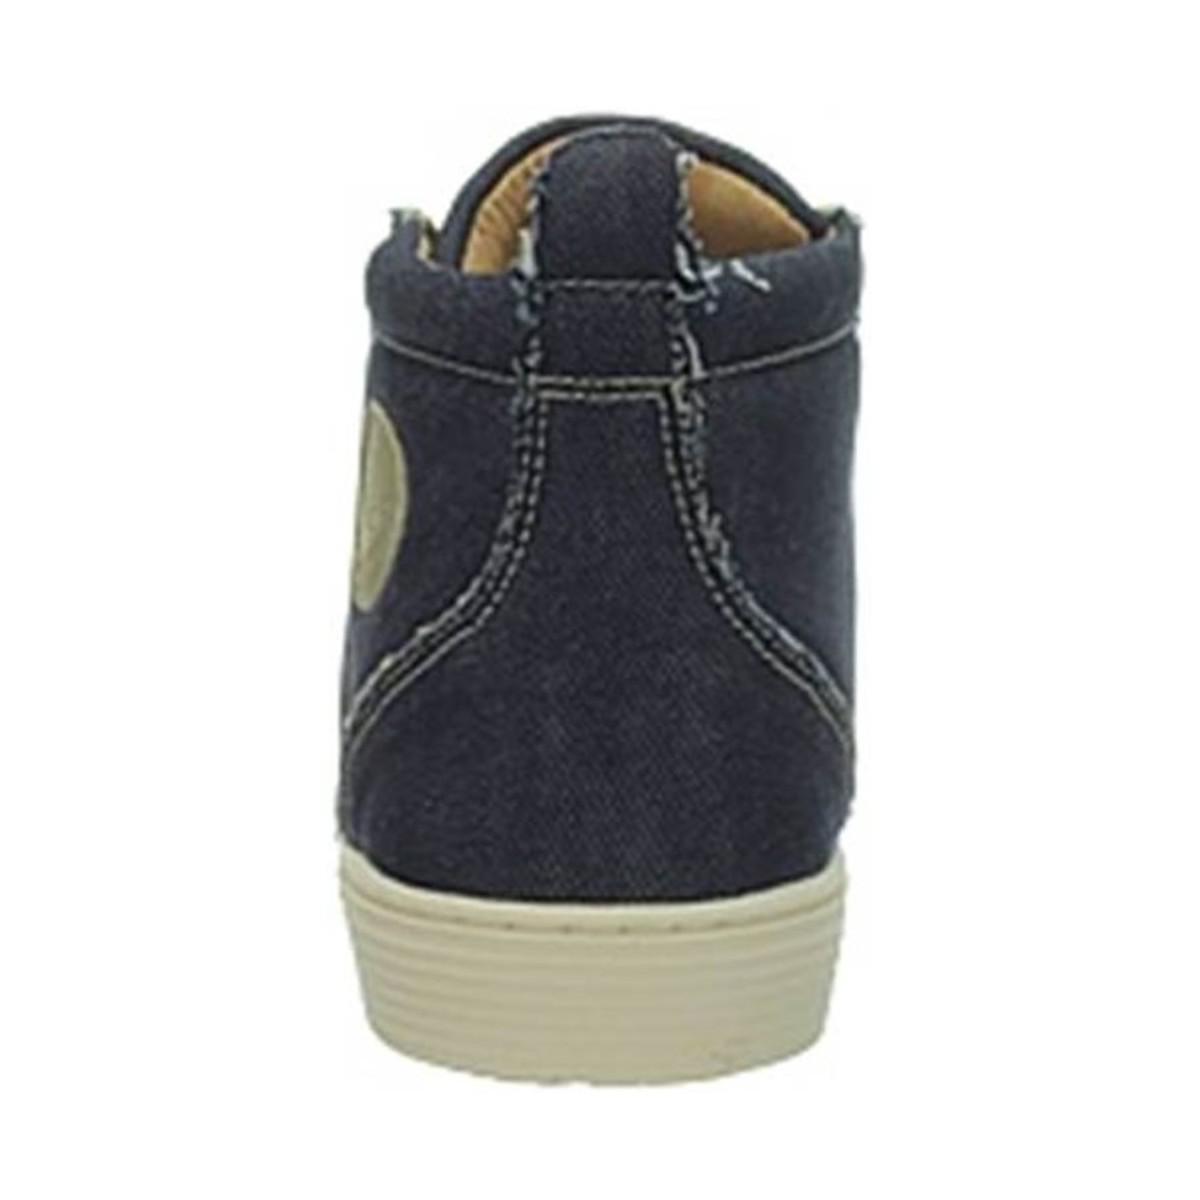 Hi-Tec Hitec Faro St Men's Shoes (high-top Trainers) In Beige in Natural for Men